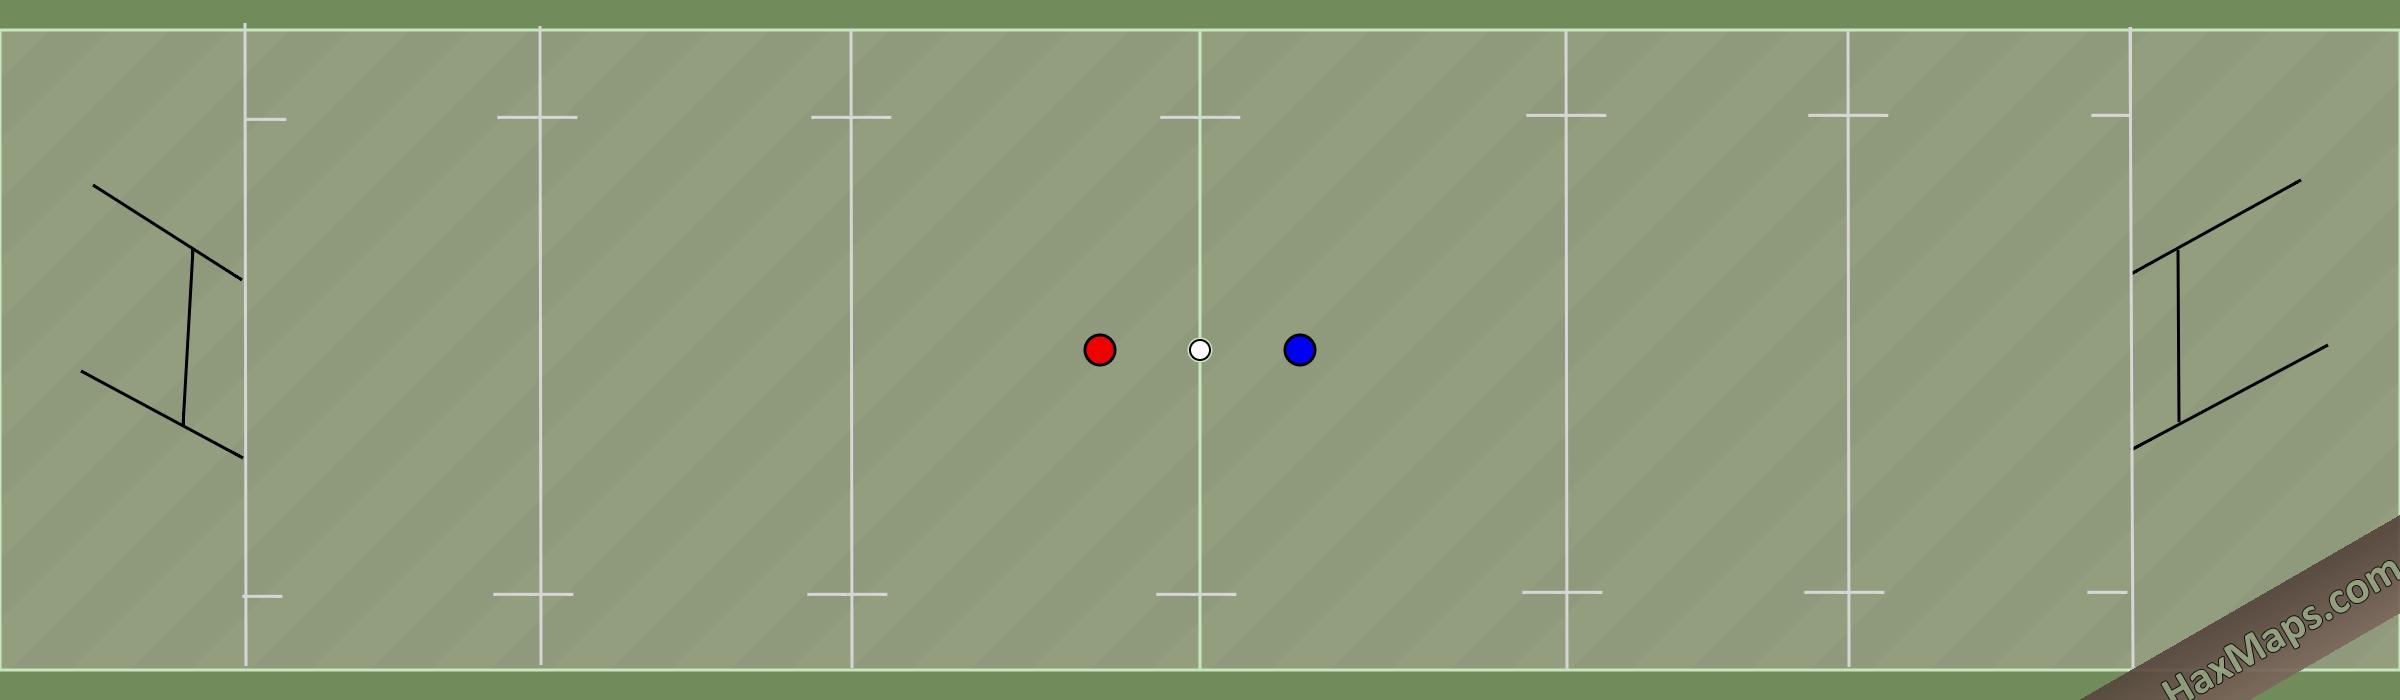 hax ball maps | Rugby-GazowaneOkno.